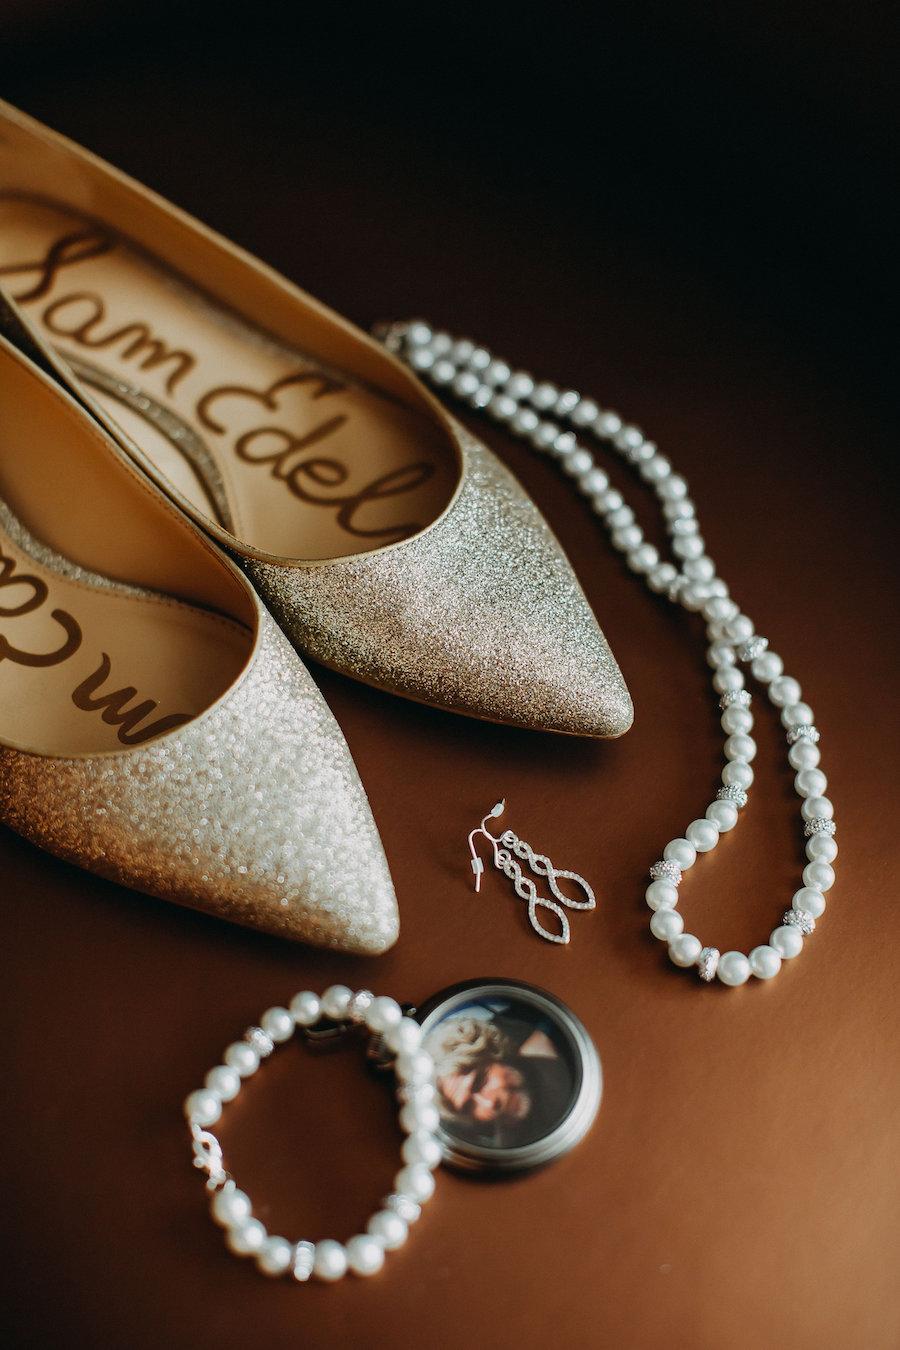 Gold Glitter Sam Edelman Wedding Shoes Flats with Bridal Jewelry